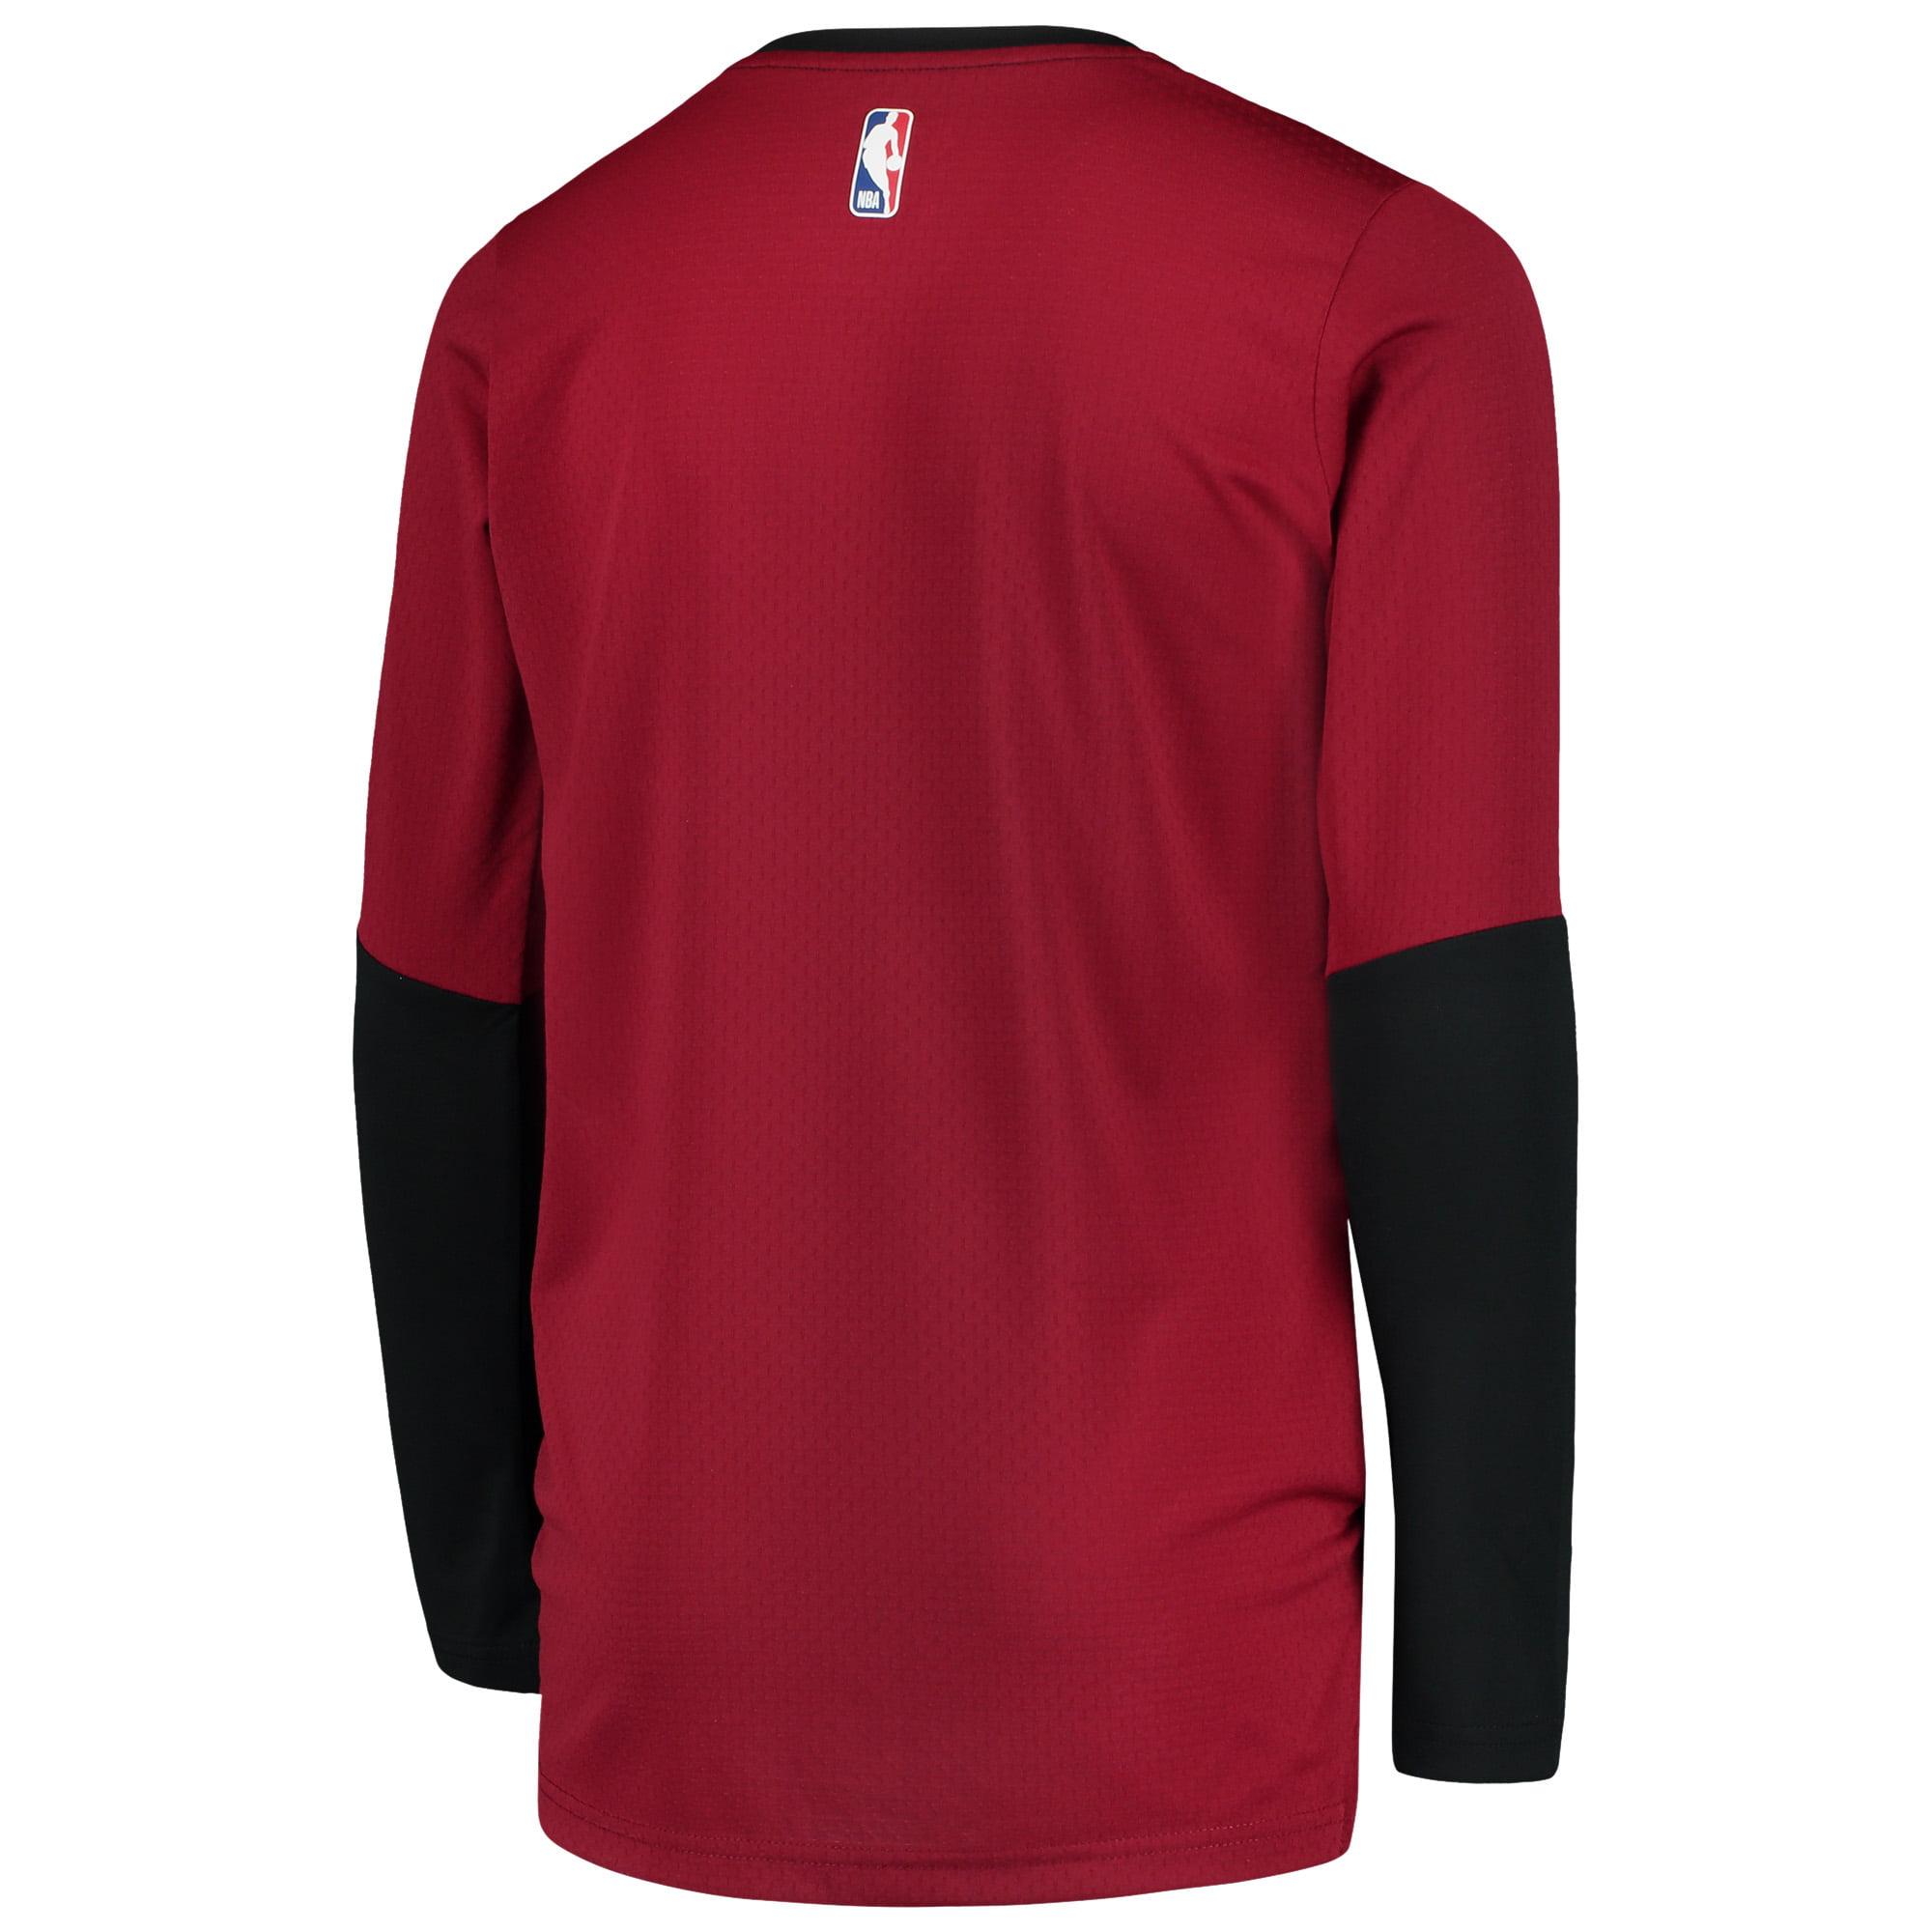 51ff9ddb Nike Youth Dri Fit Performance Long Sleeve Shirts - DREAMWORKS